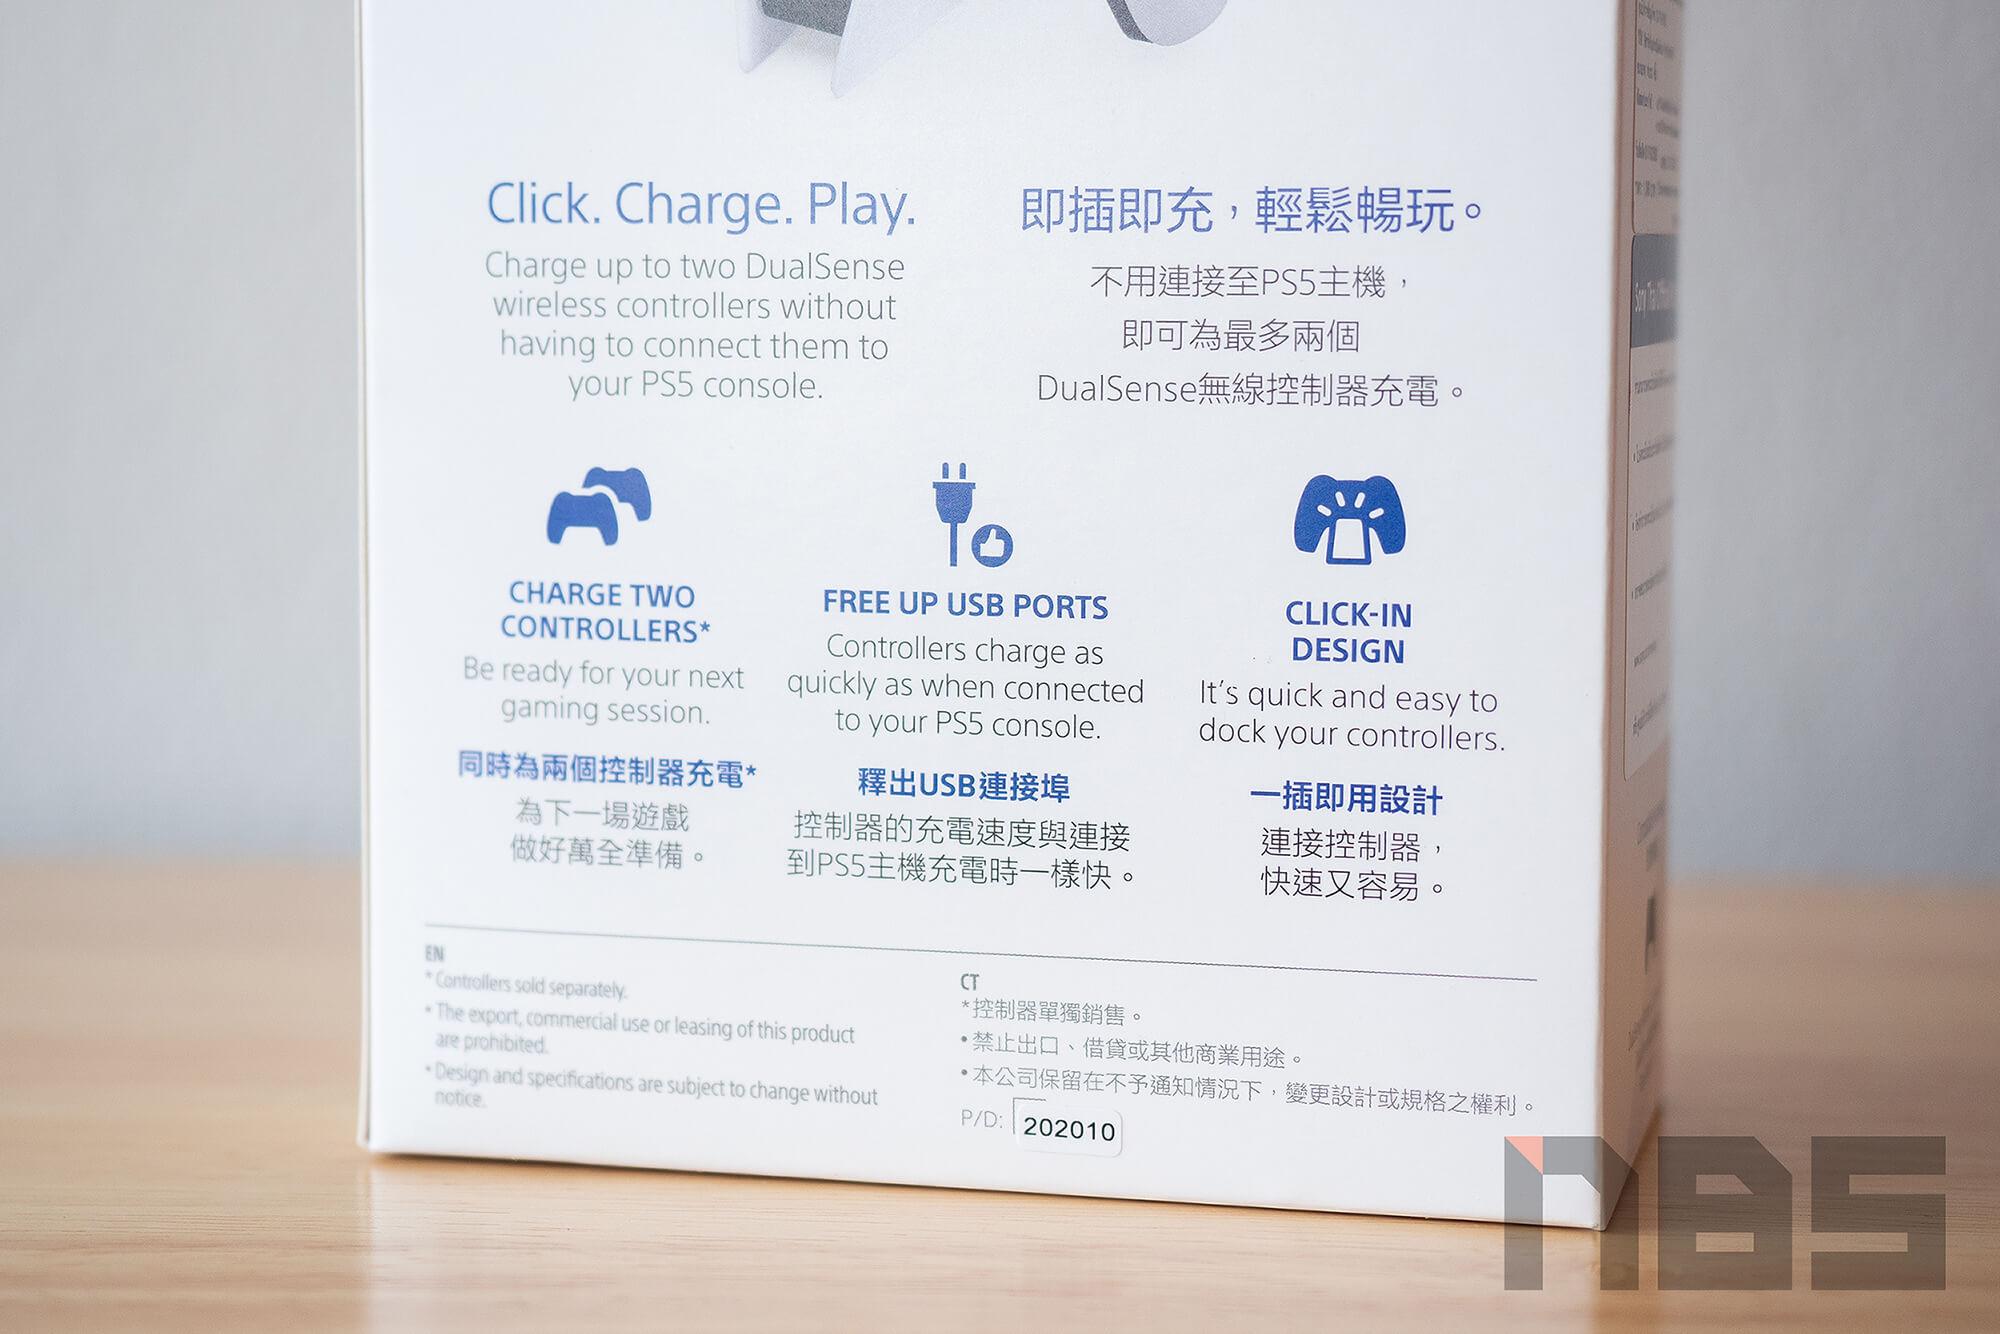 Review PlayStation 5 DualSense Charging Station NotebookSPEC 02